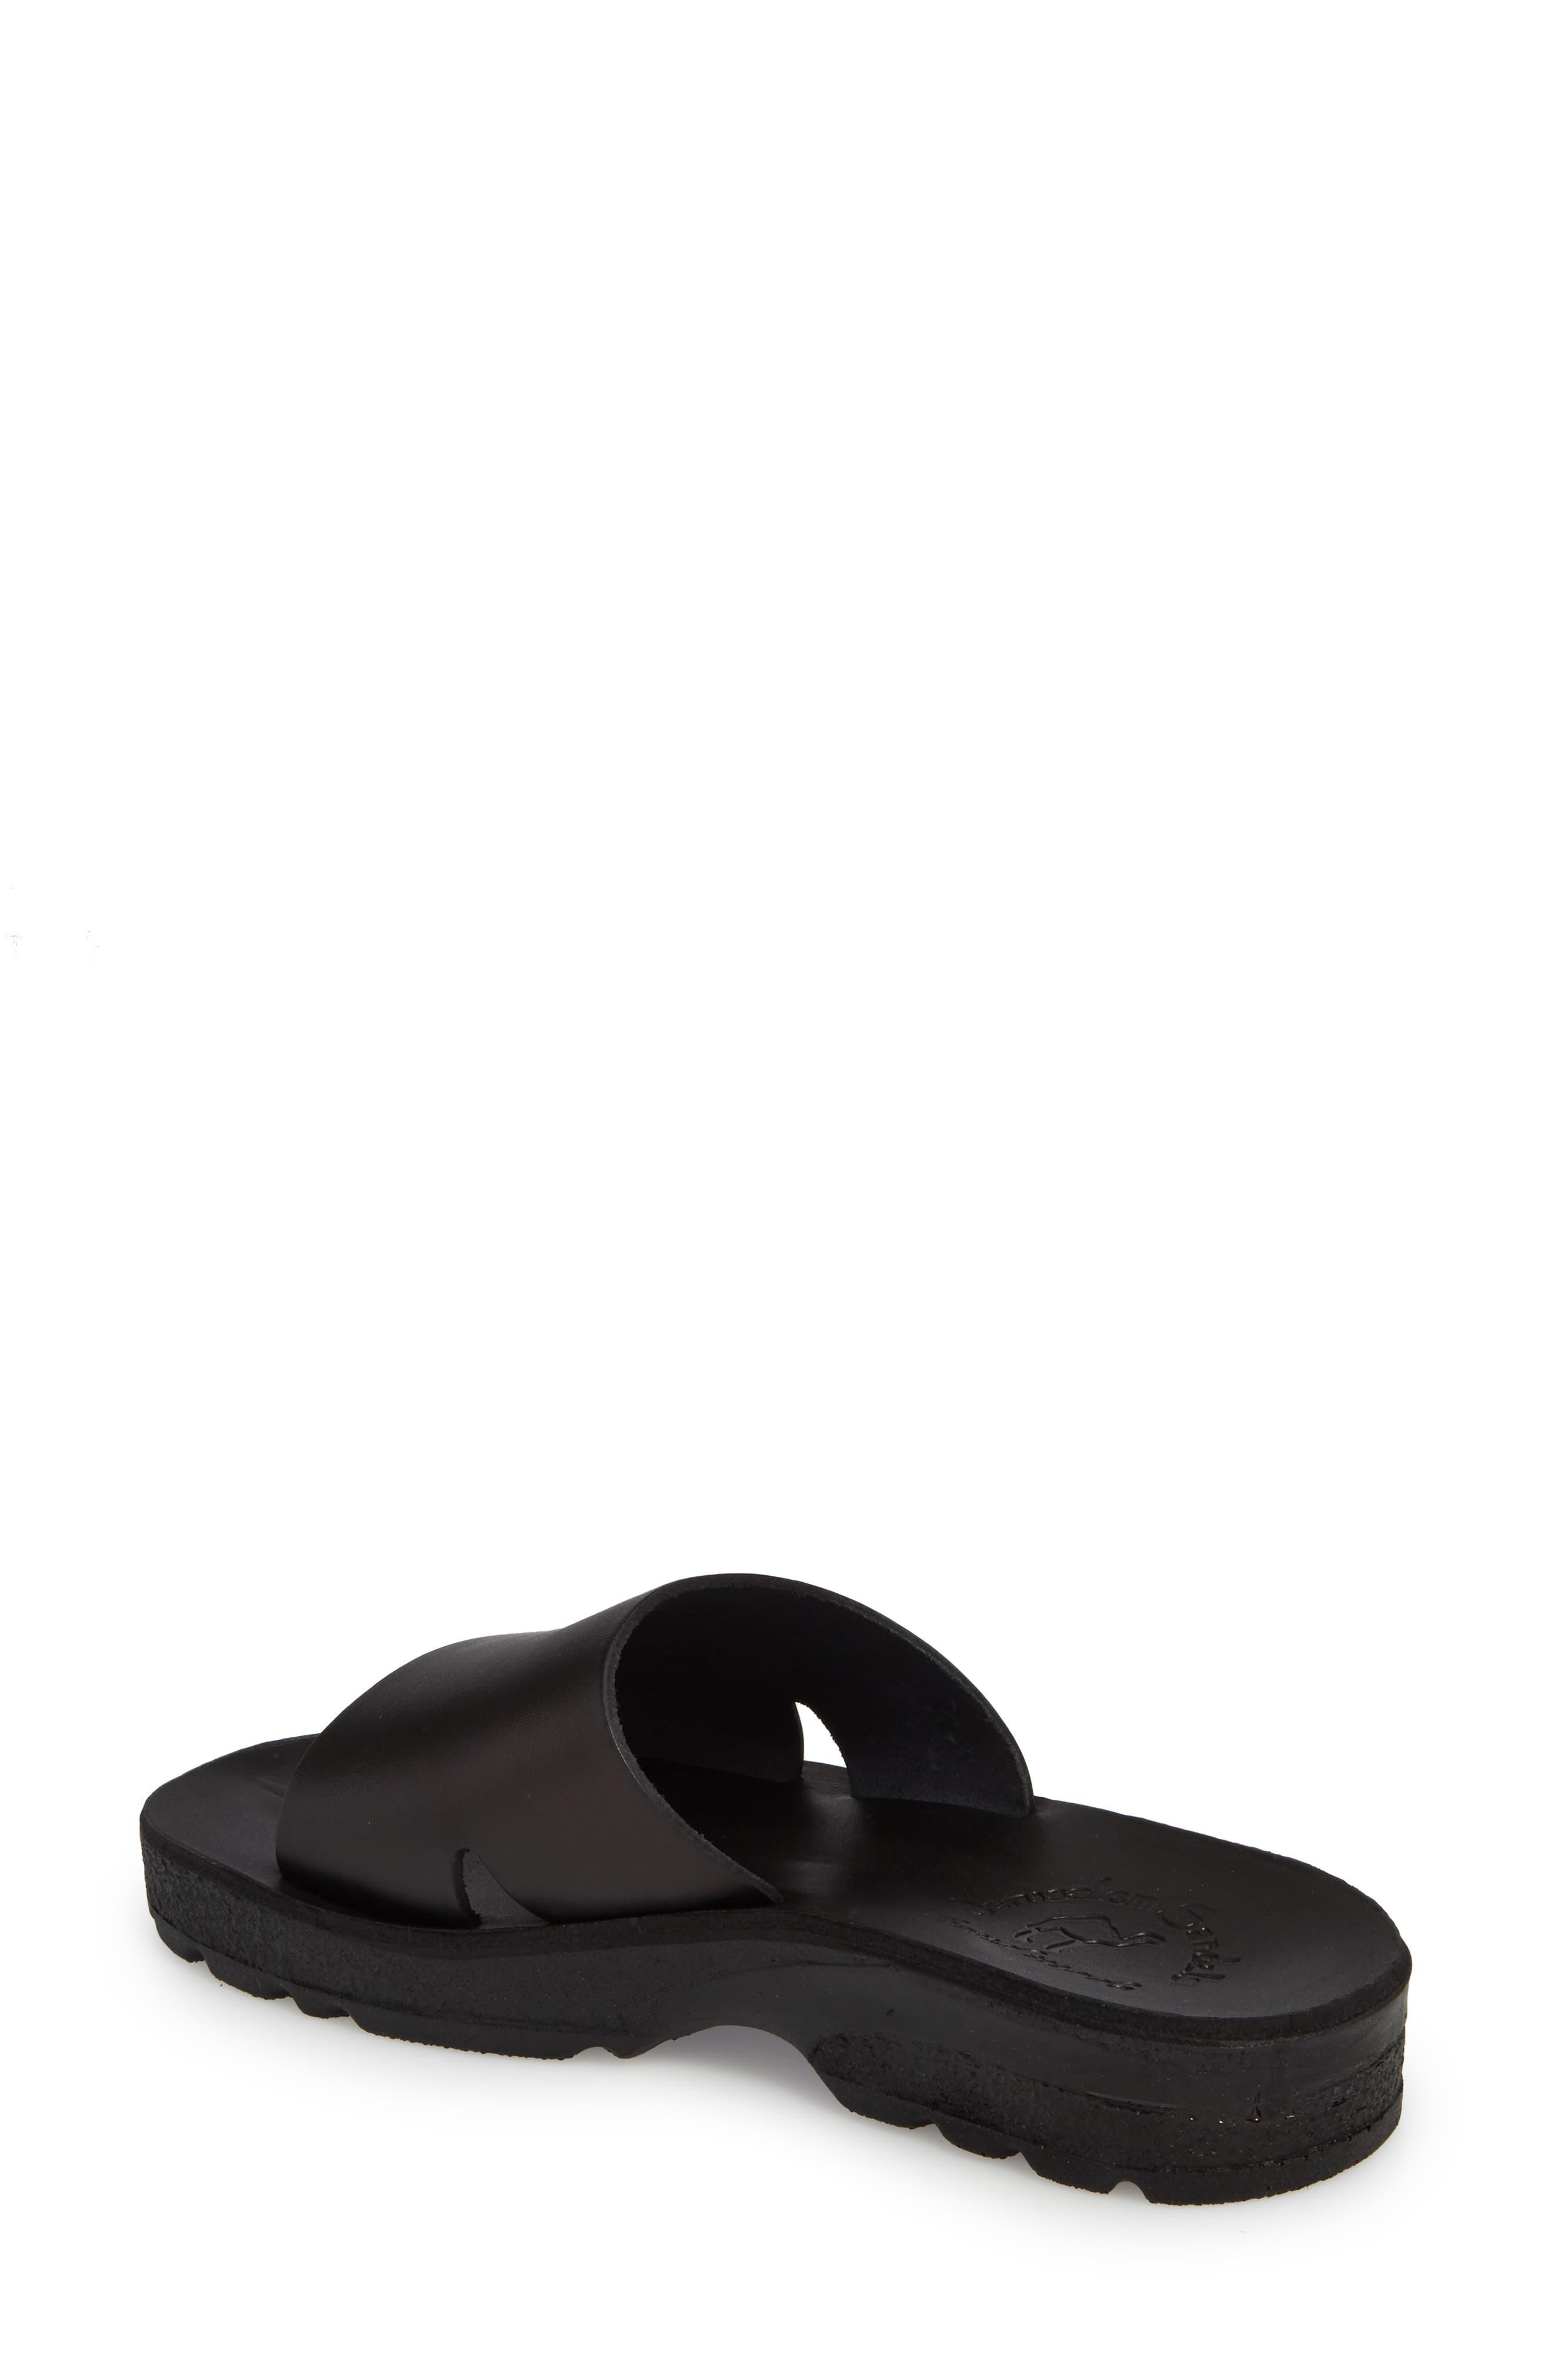 Bashn Molded Footbed Slide Sandal,                             Alternate thumbnail 2, color,                             Black Leather